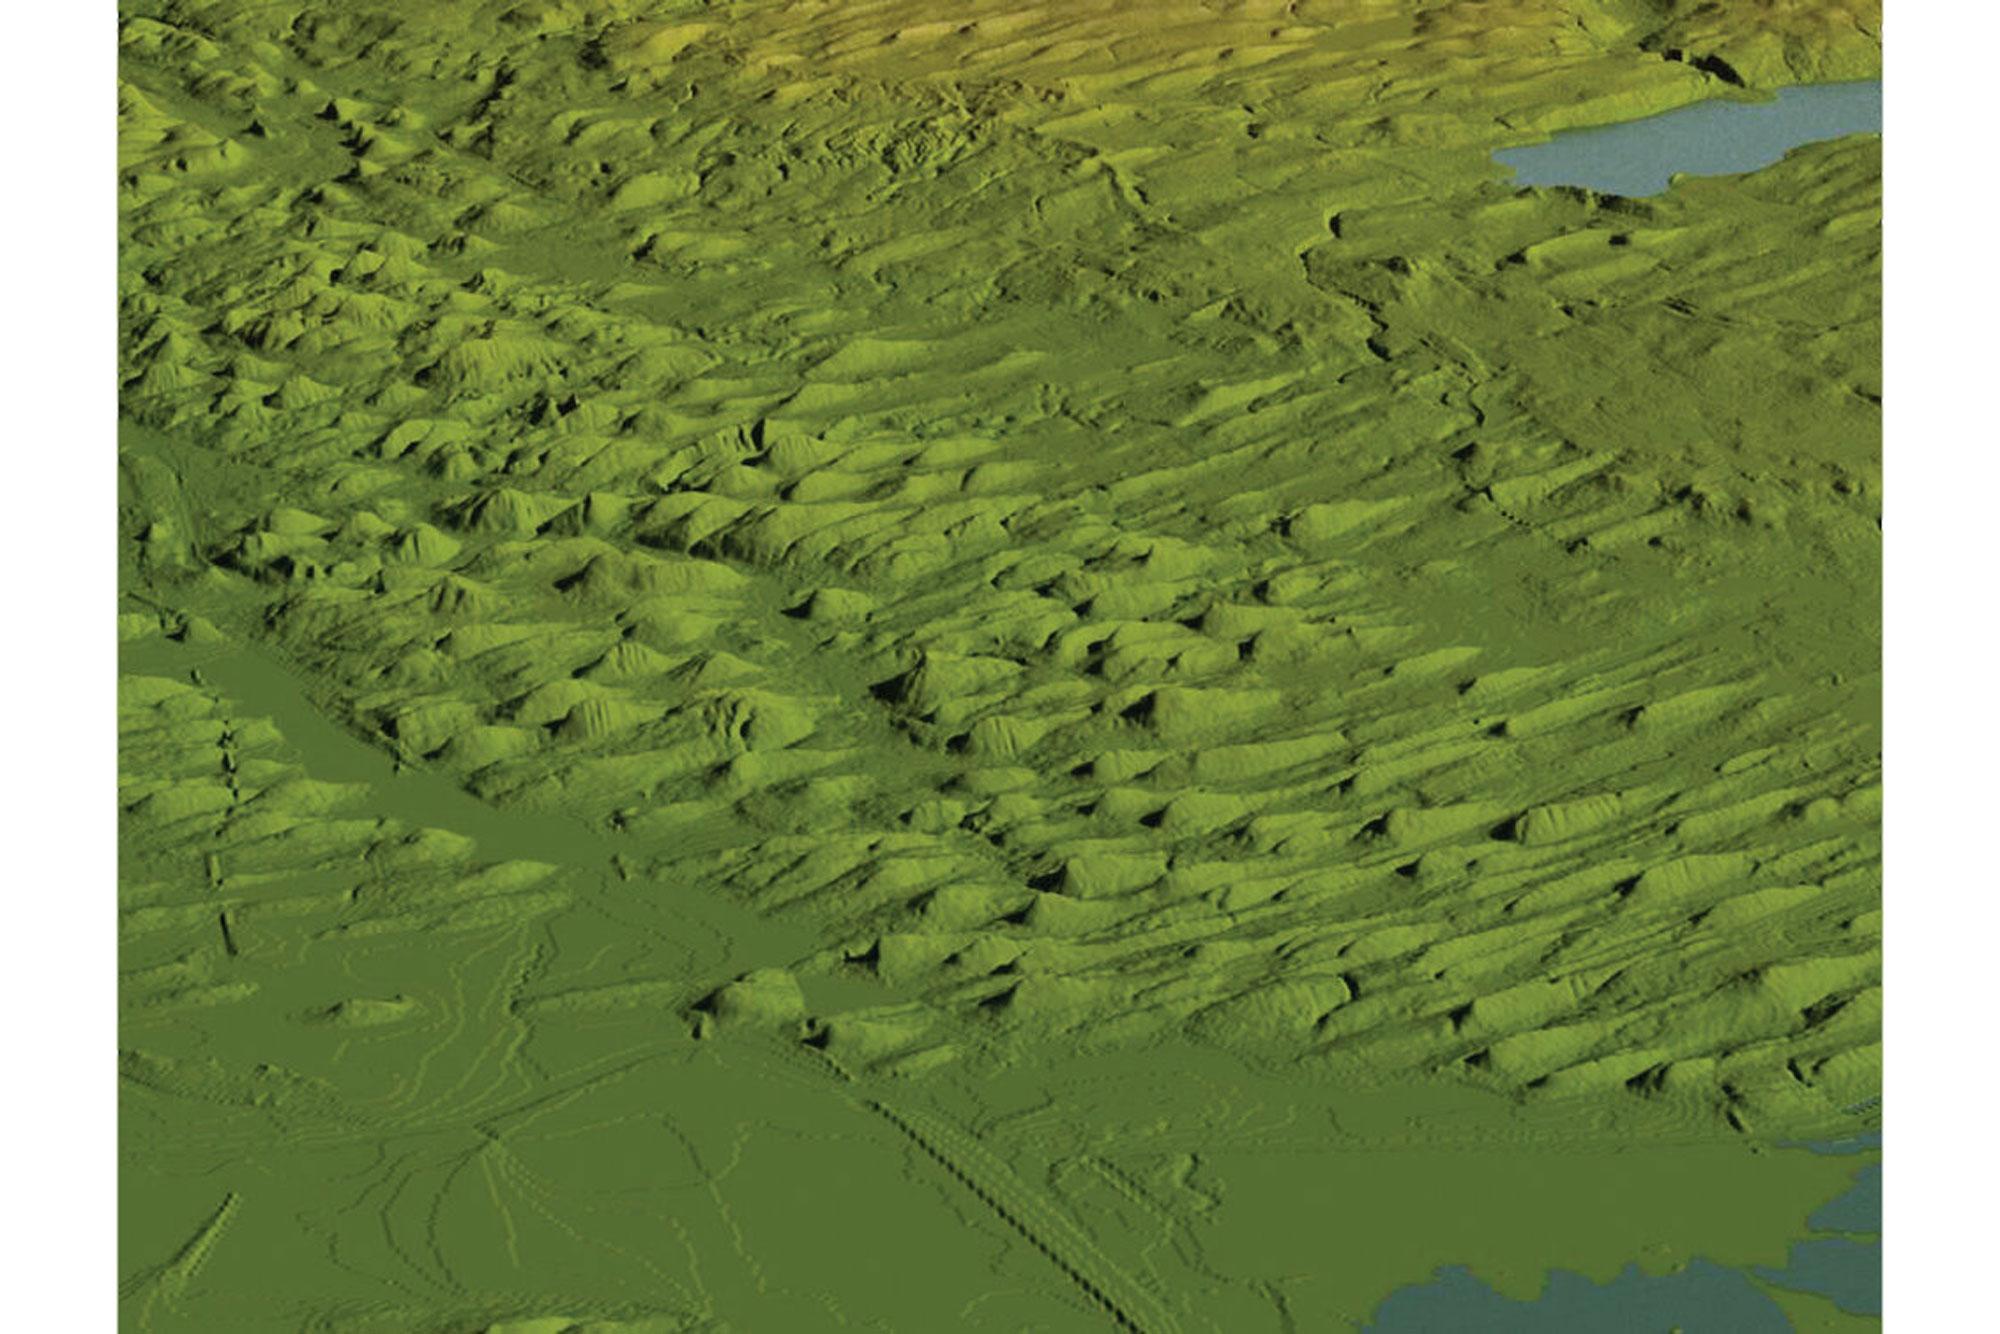 Image showing a drumlin field near Auburn, New York.